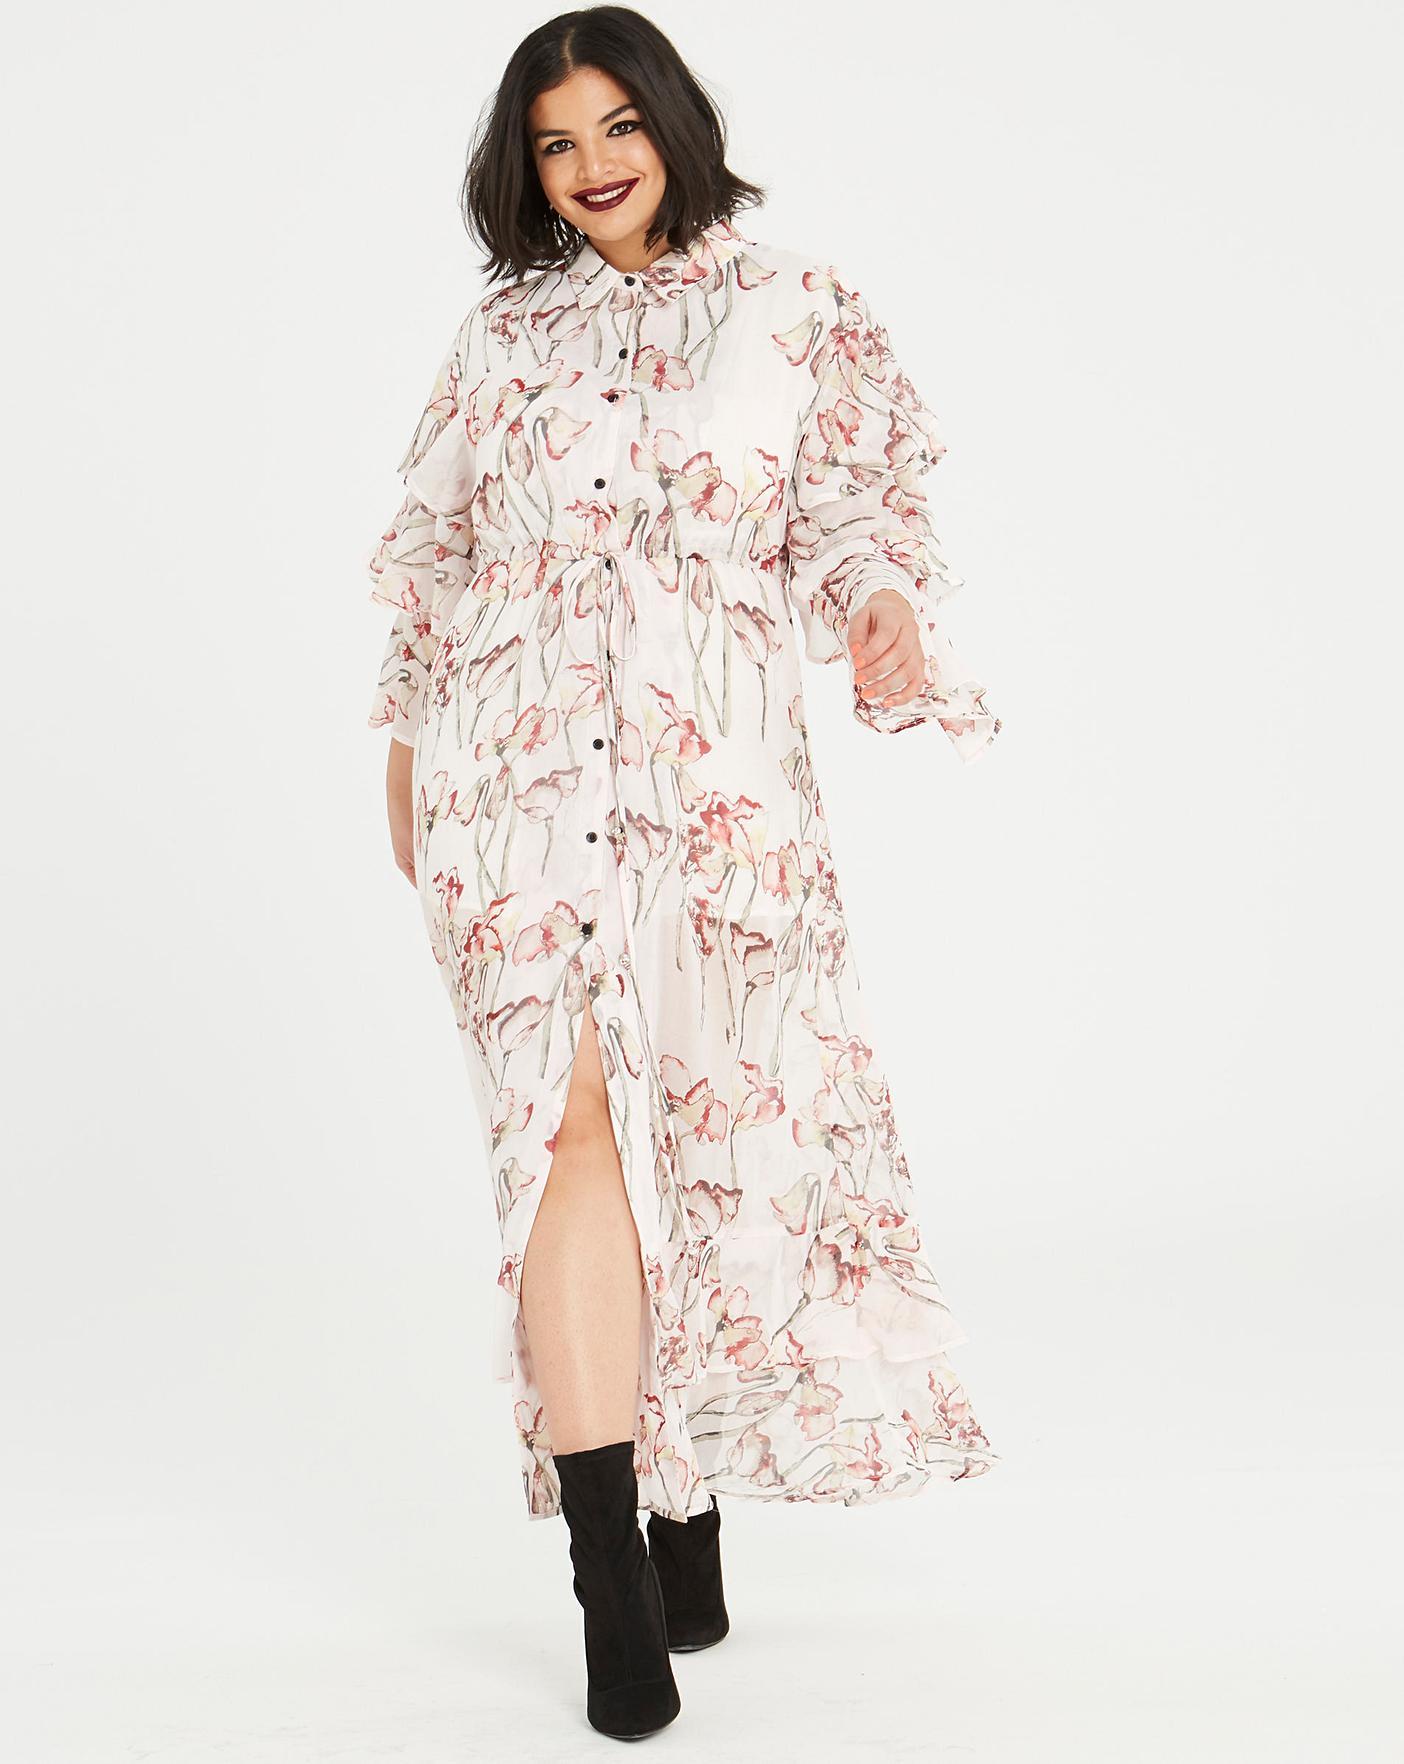 aa515f482aa1 Religion Care Maxi Dress | Simply Be